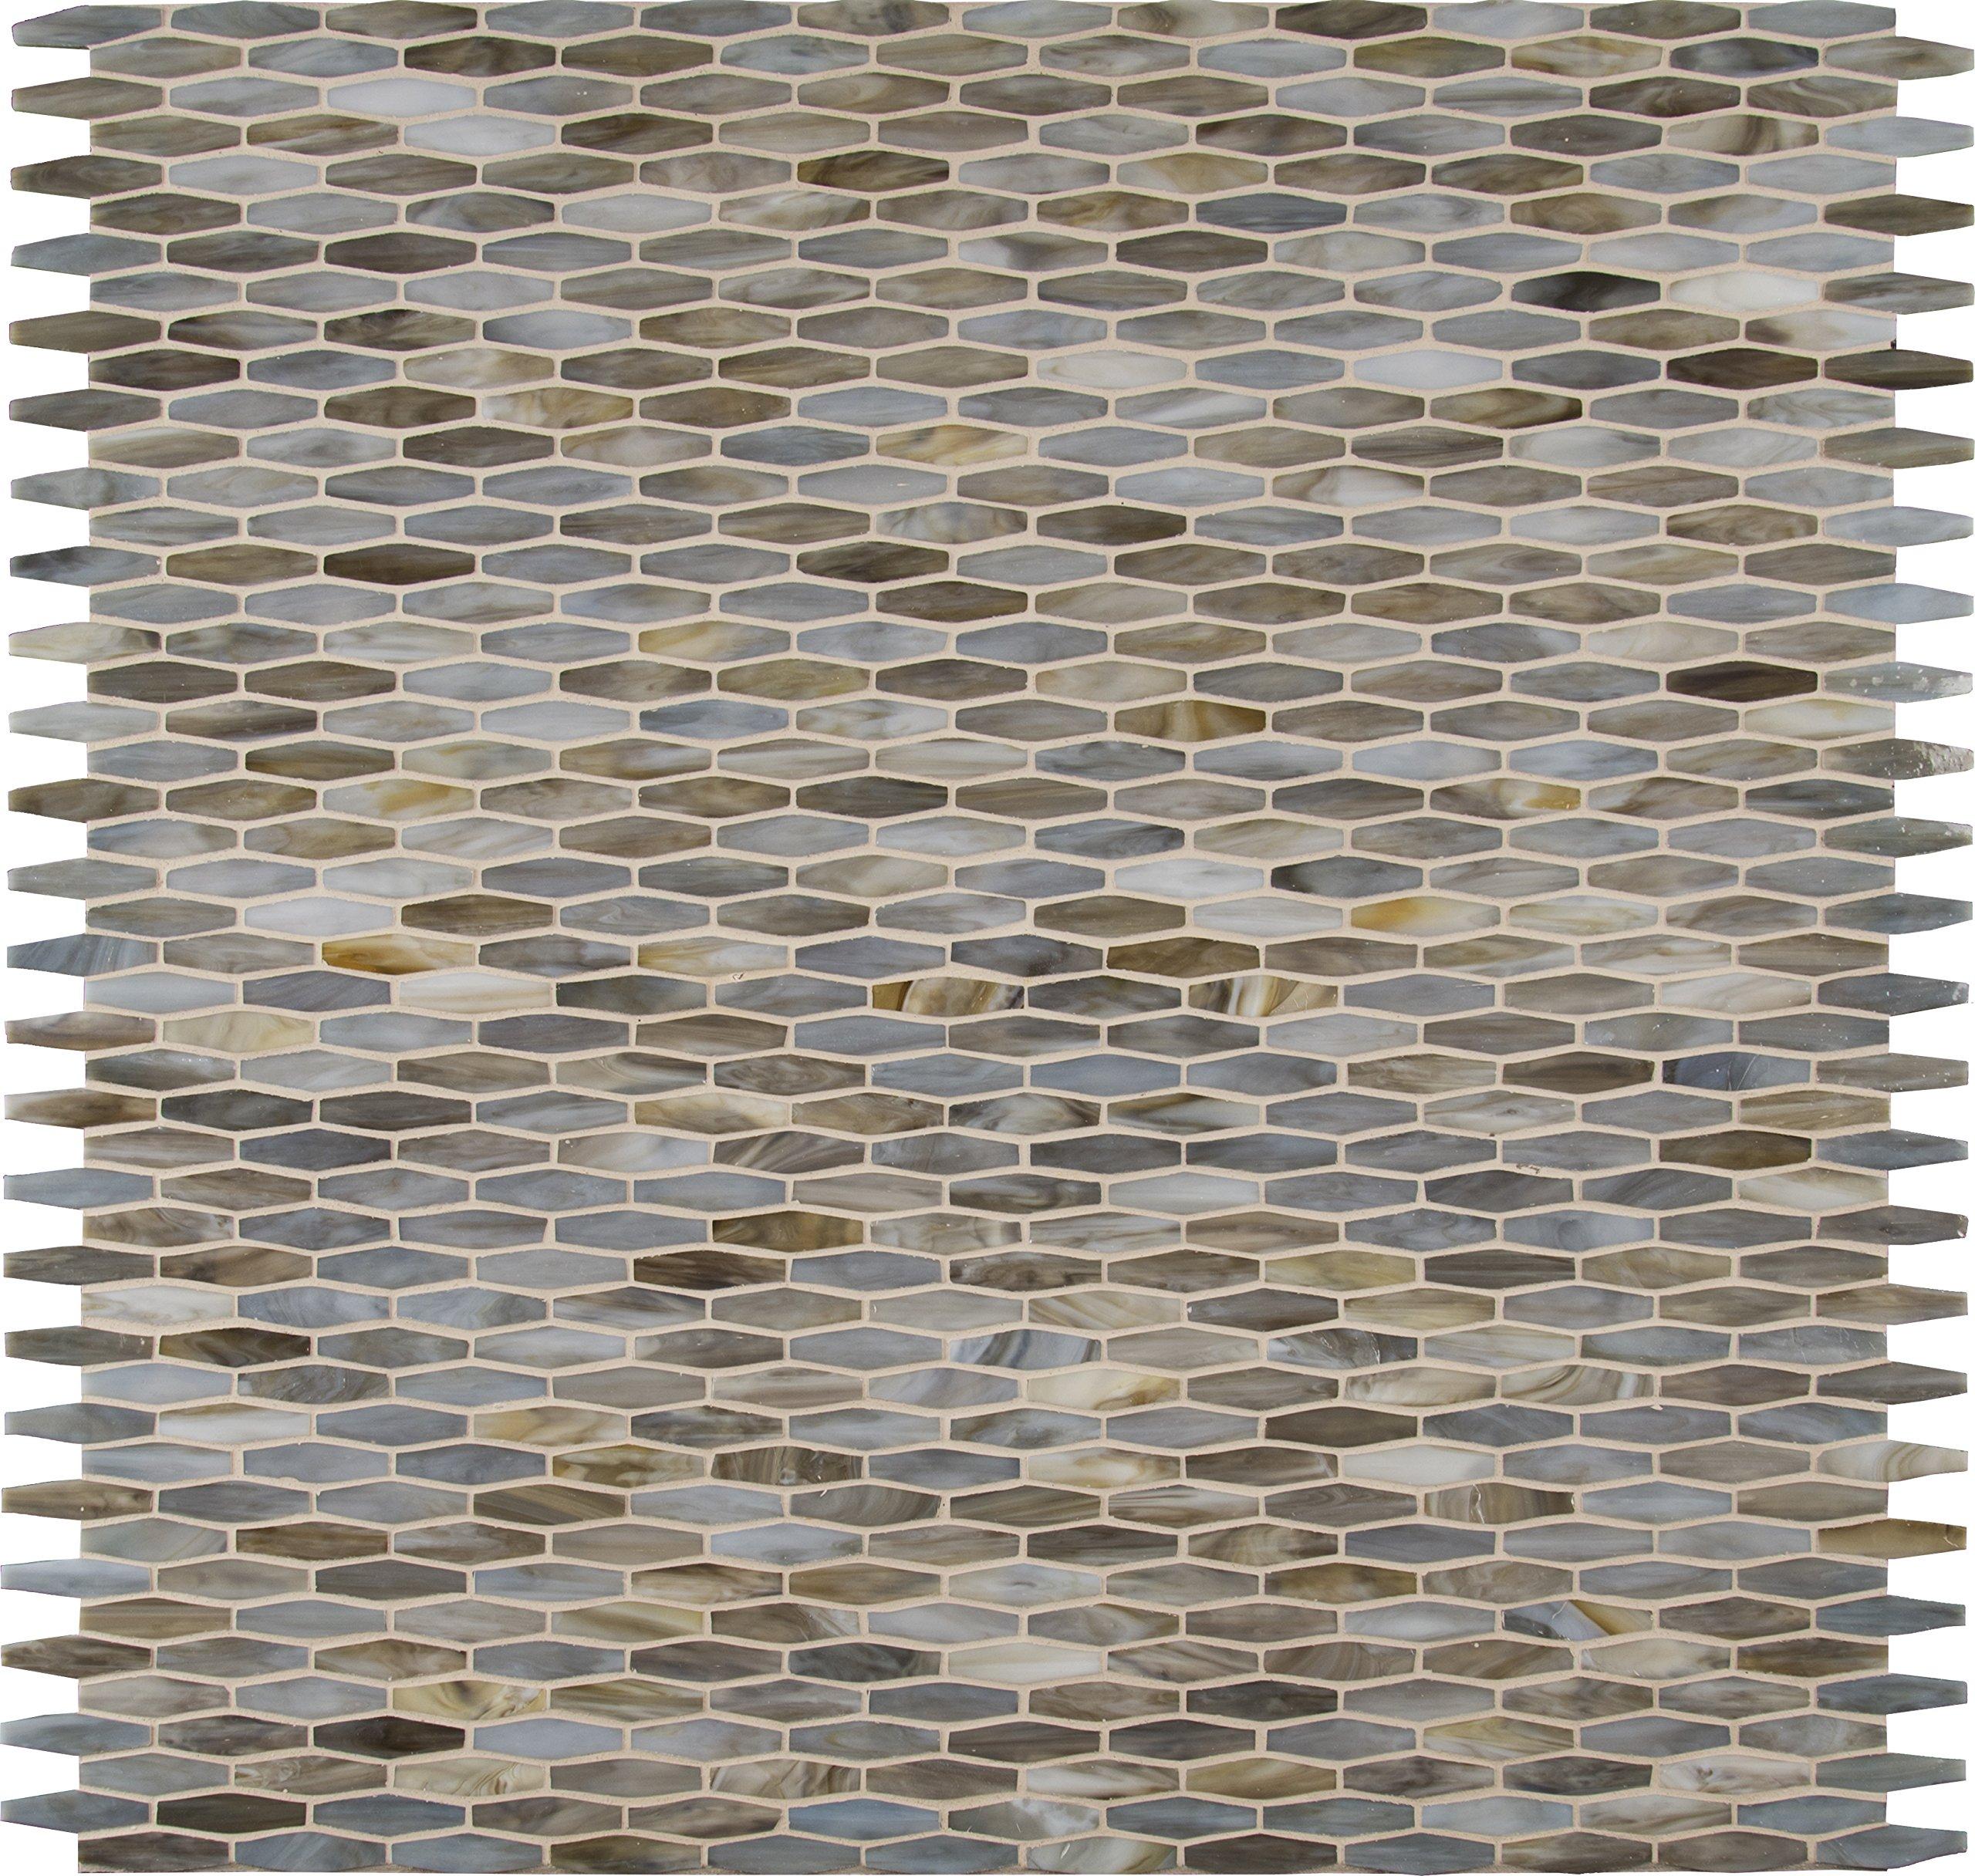 M S International Mochachino Mocha Chino 12 In. X 12 In. X 3mm Glass Mesh-Mounted Mosaic Wall Tile, (20 sq. ft., 20 pieces per case)